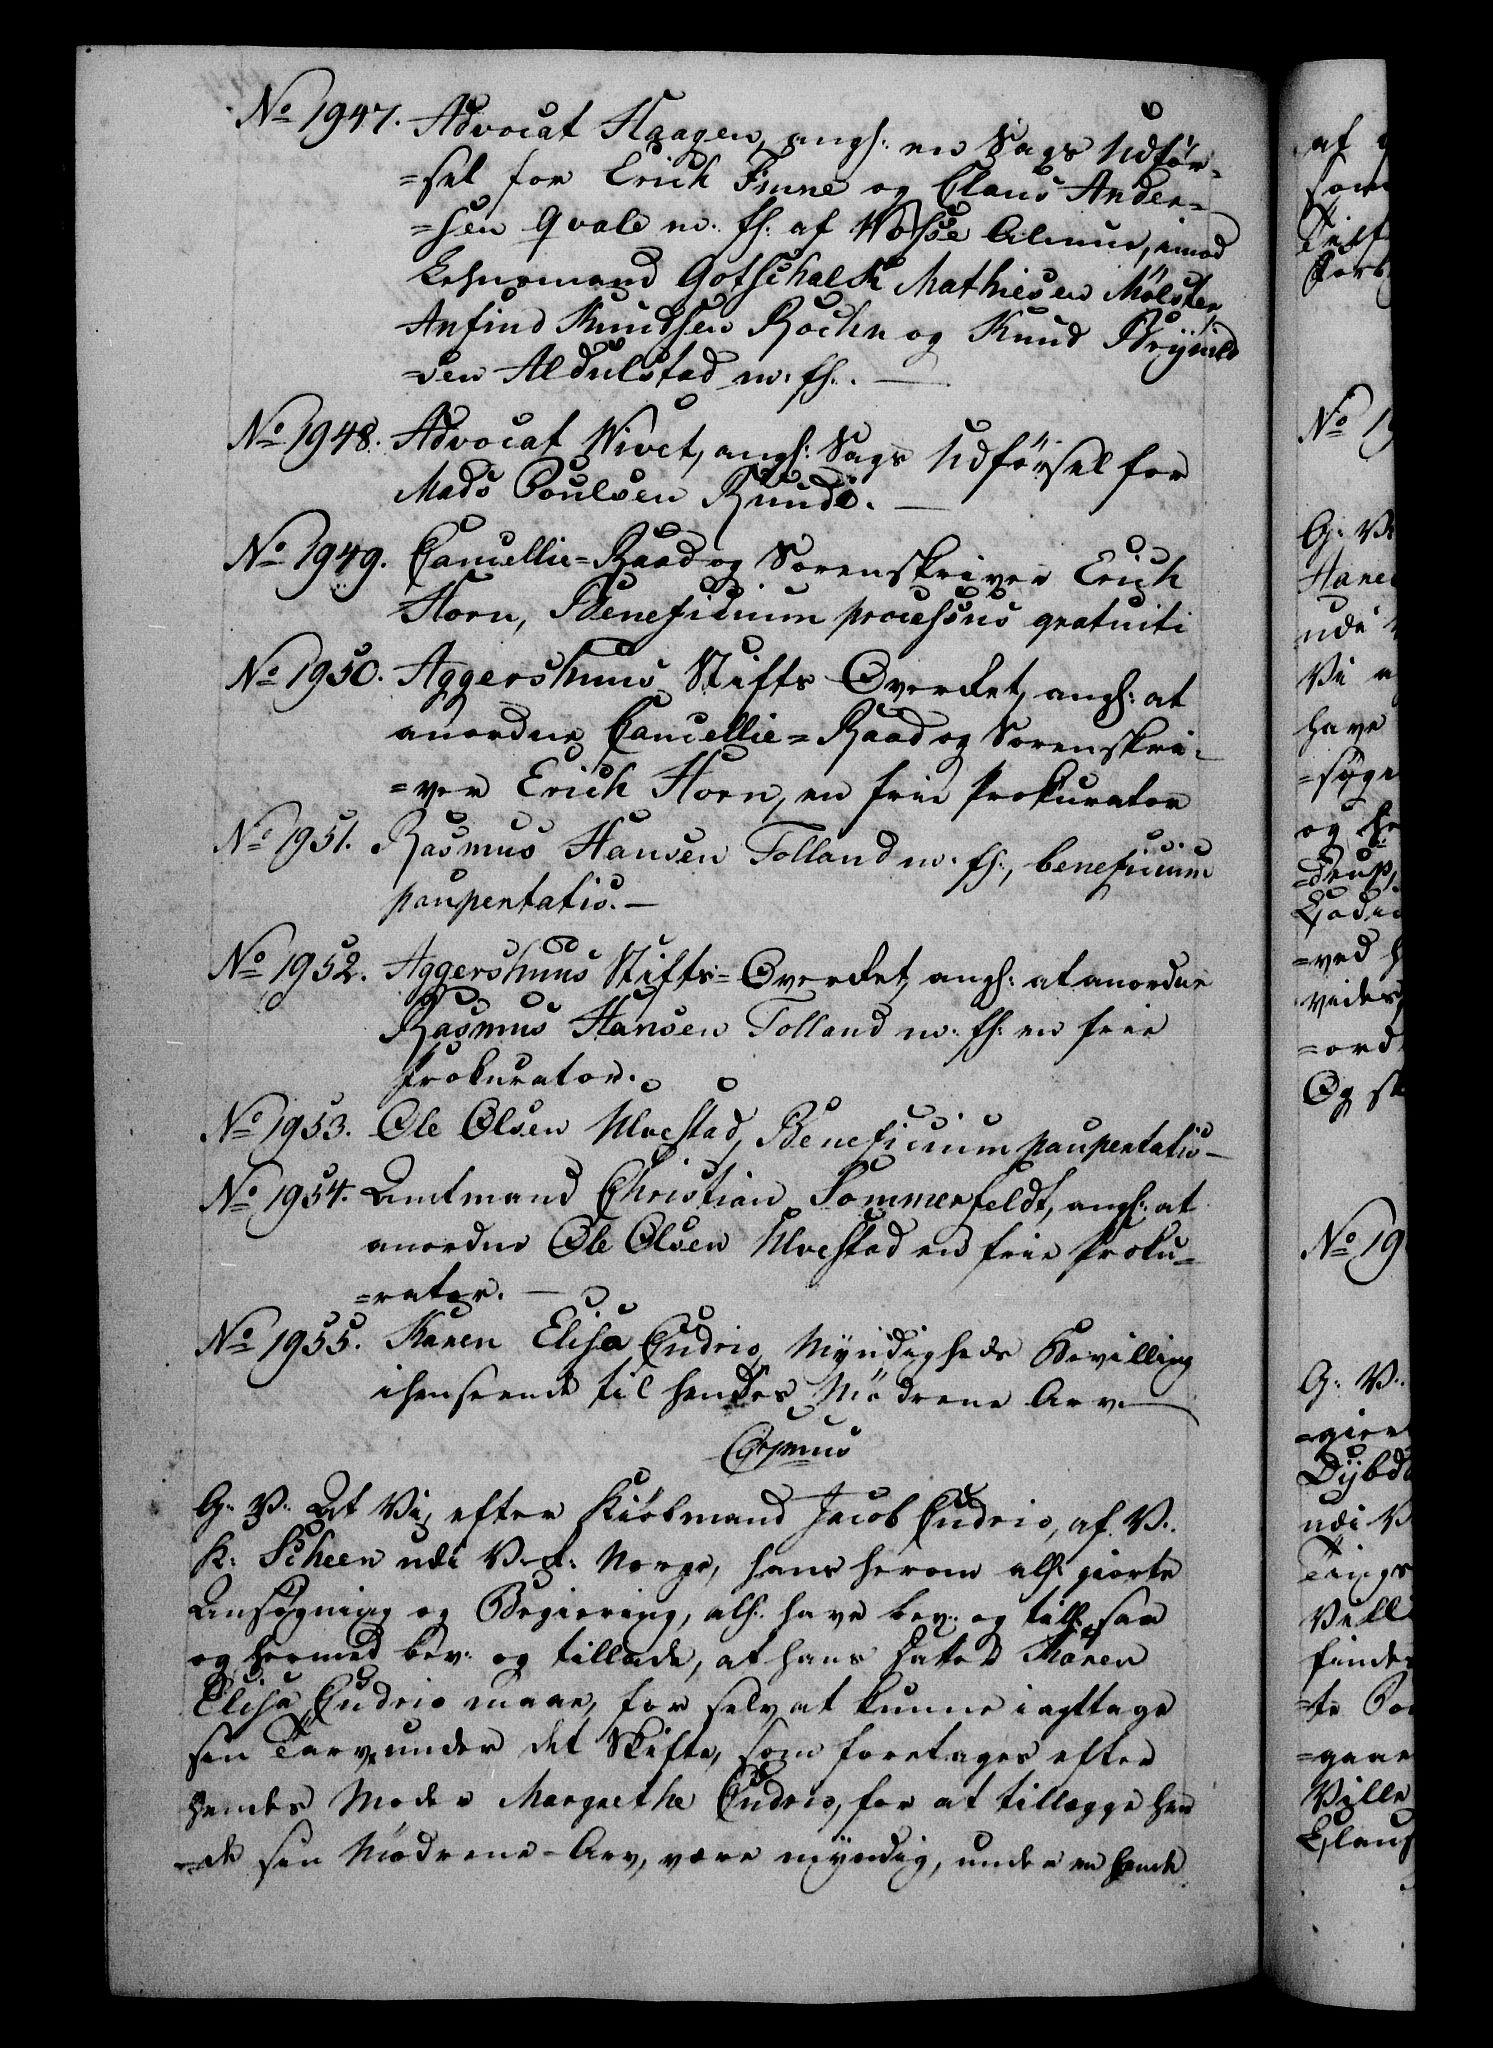 RA, Danske Kanselli 1800-1814, H/Hf/Hfb/Hfba/L0001: Registranter, 1800-1801, s. 444b